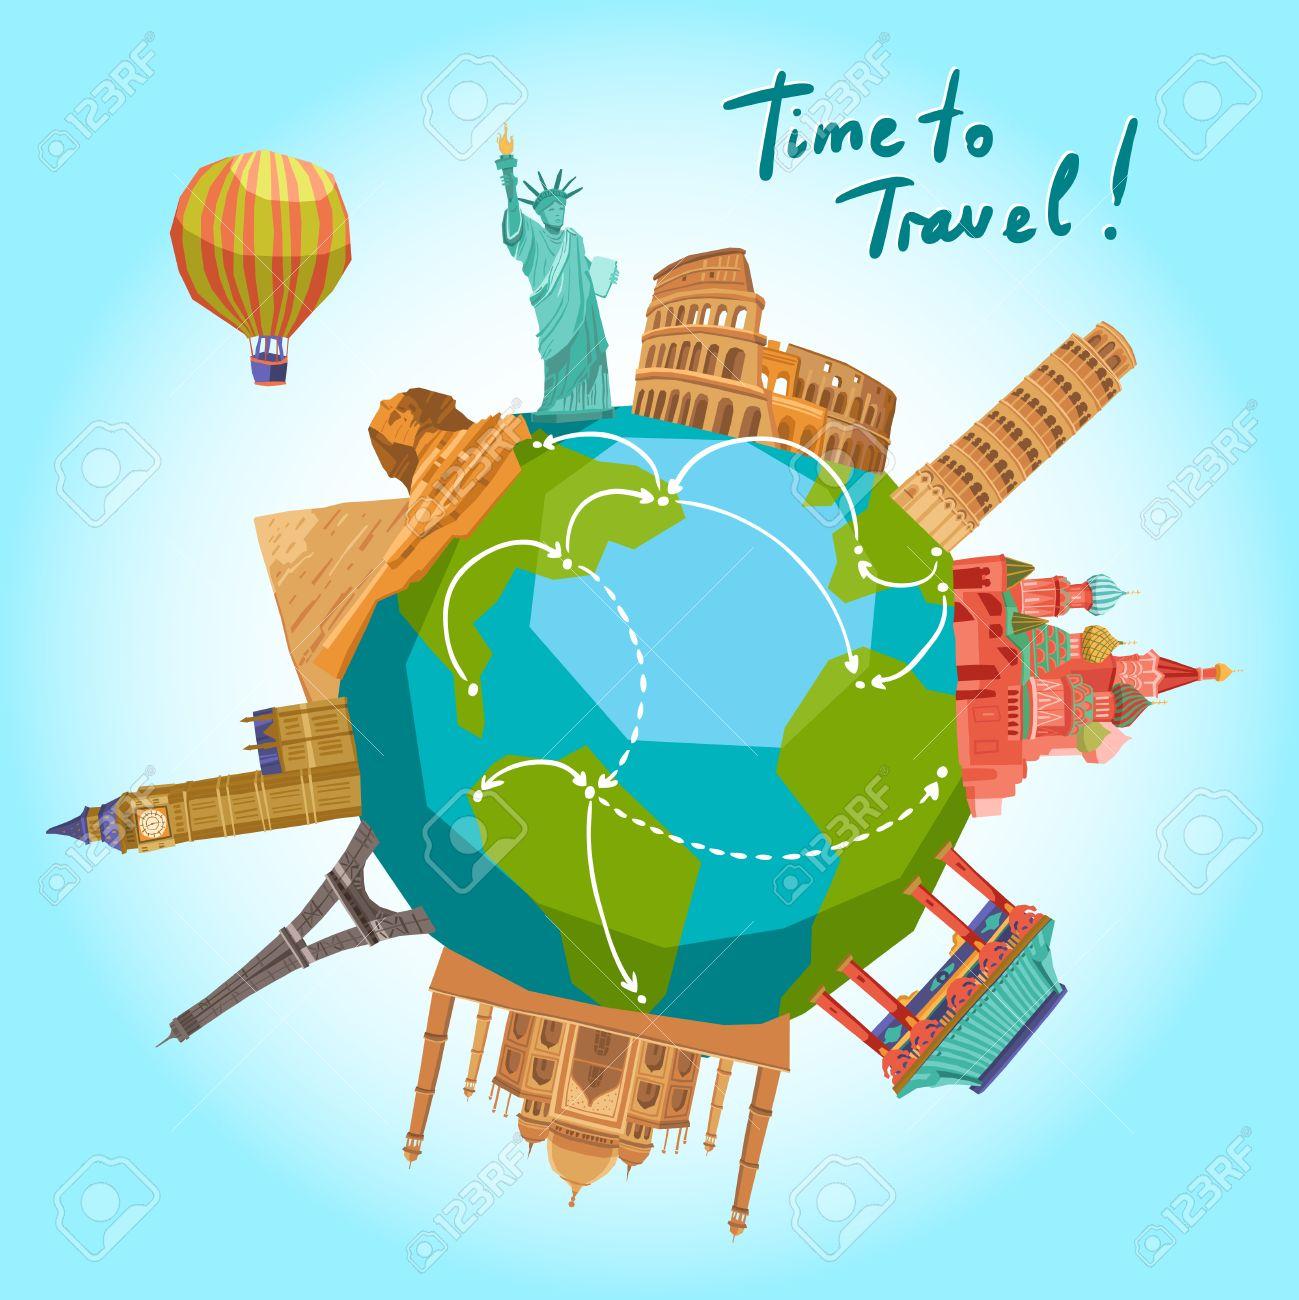 World Travel Clipart & Clip Art Images #32737.